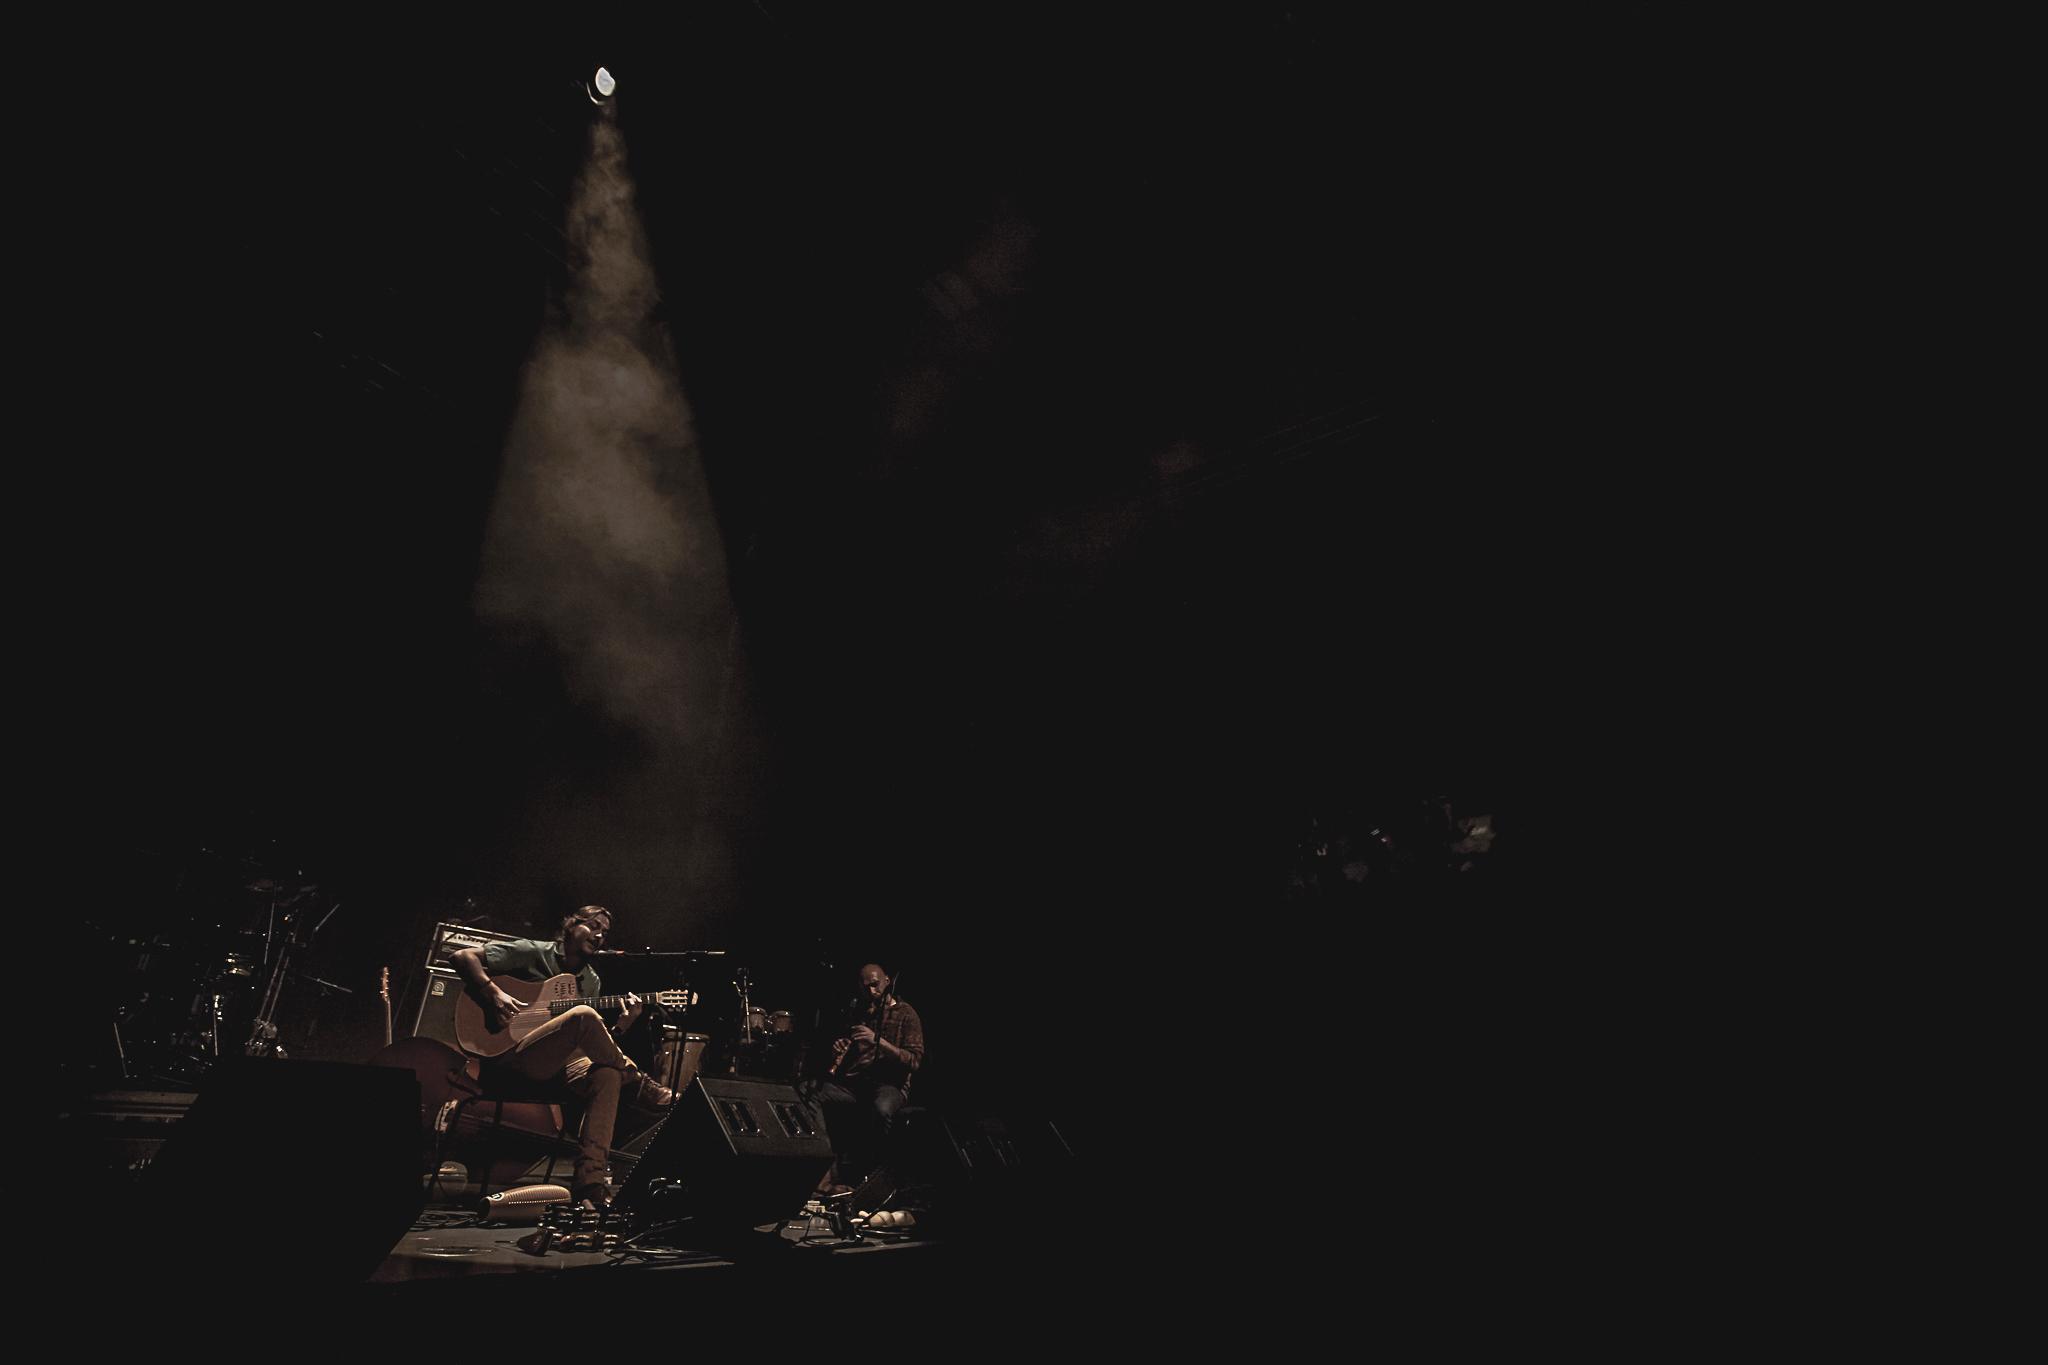 Edu Mundo Sala Suggia Casa da Musica Photography Fotografia On Stage Concert bonjourmolotov Andre Gigante 14